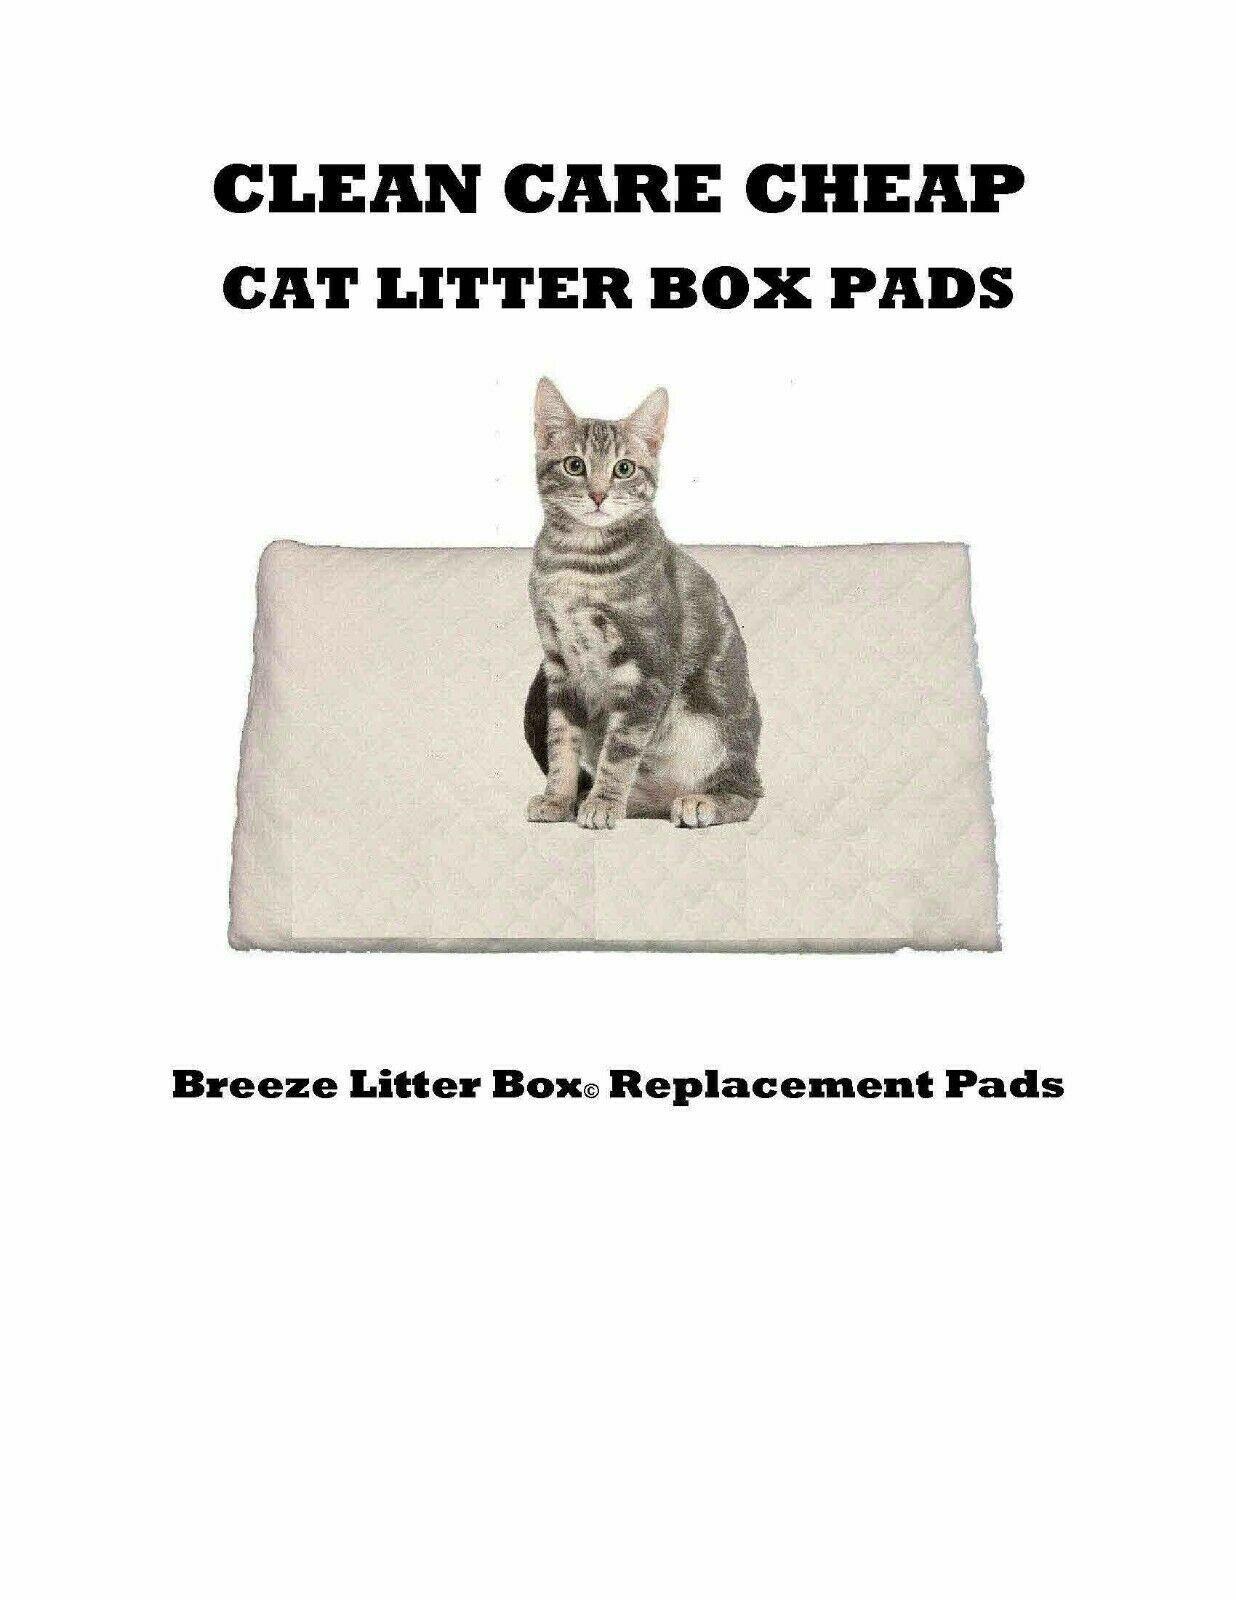 40 Clean Care Cat Litter Box Liner Pads for Breeze Litter